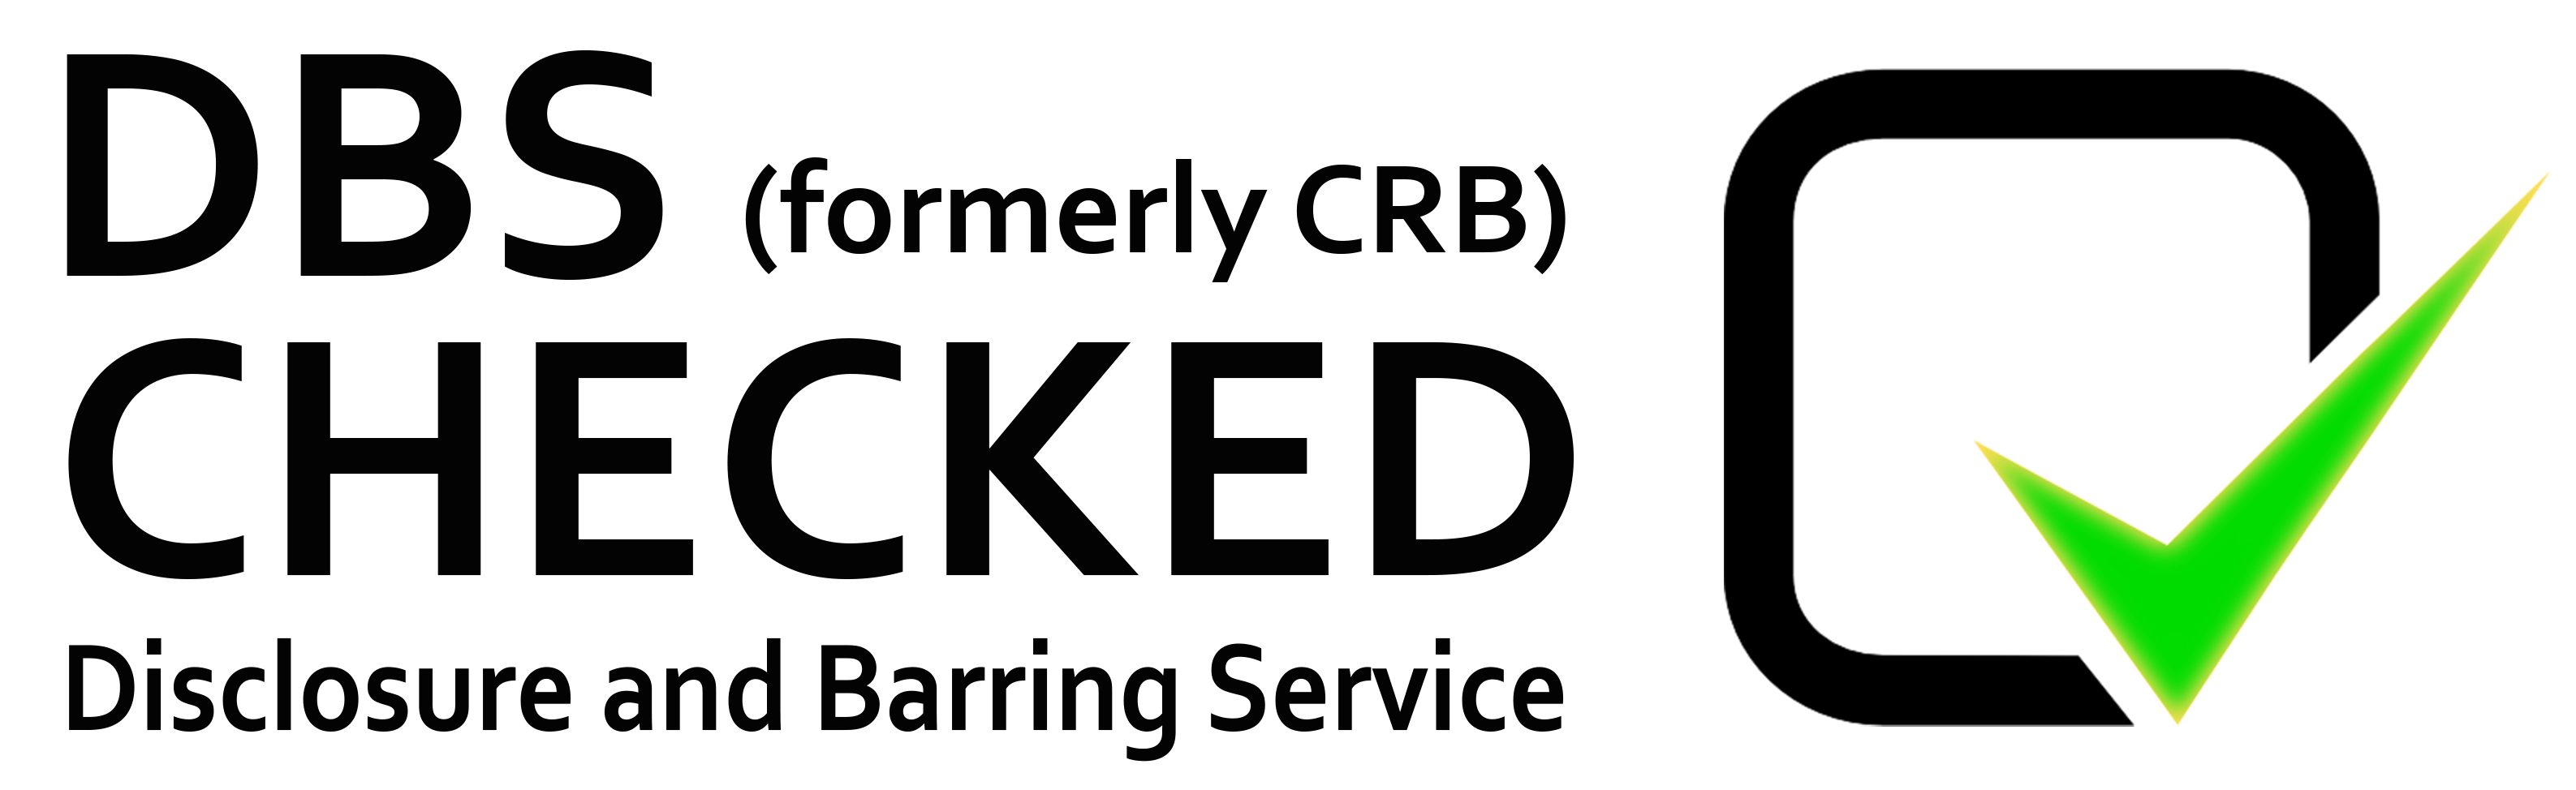 DBS logo - Logo Dbs PNG